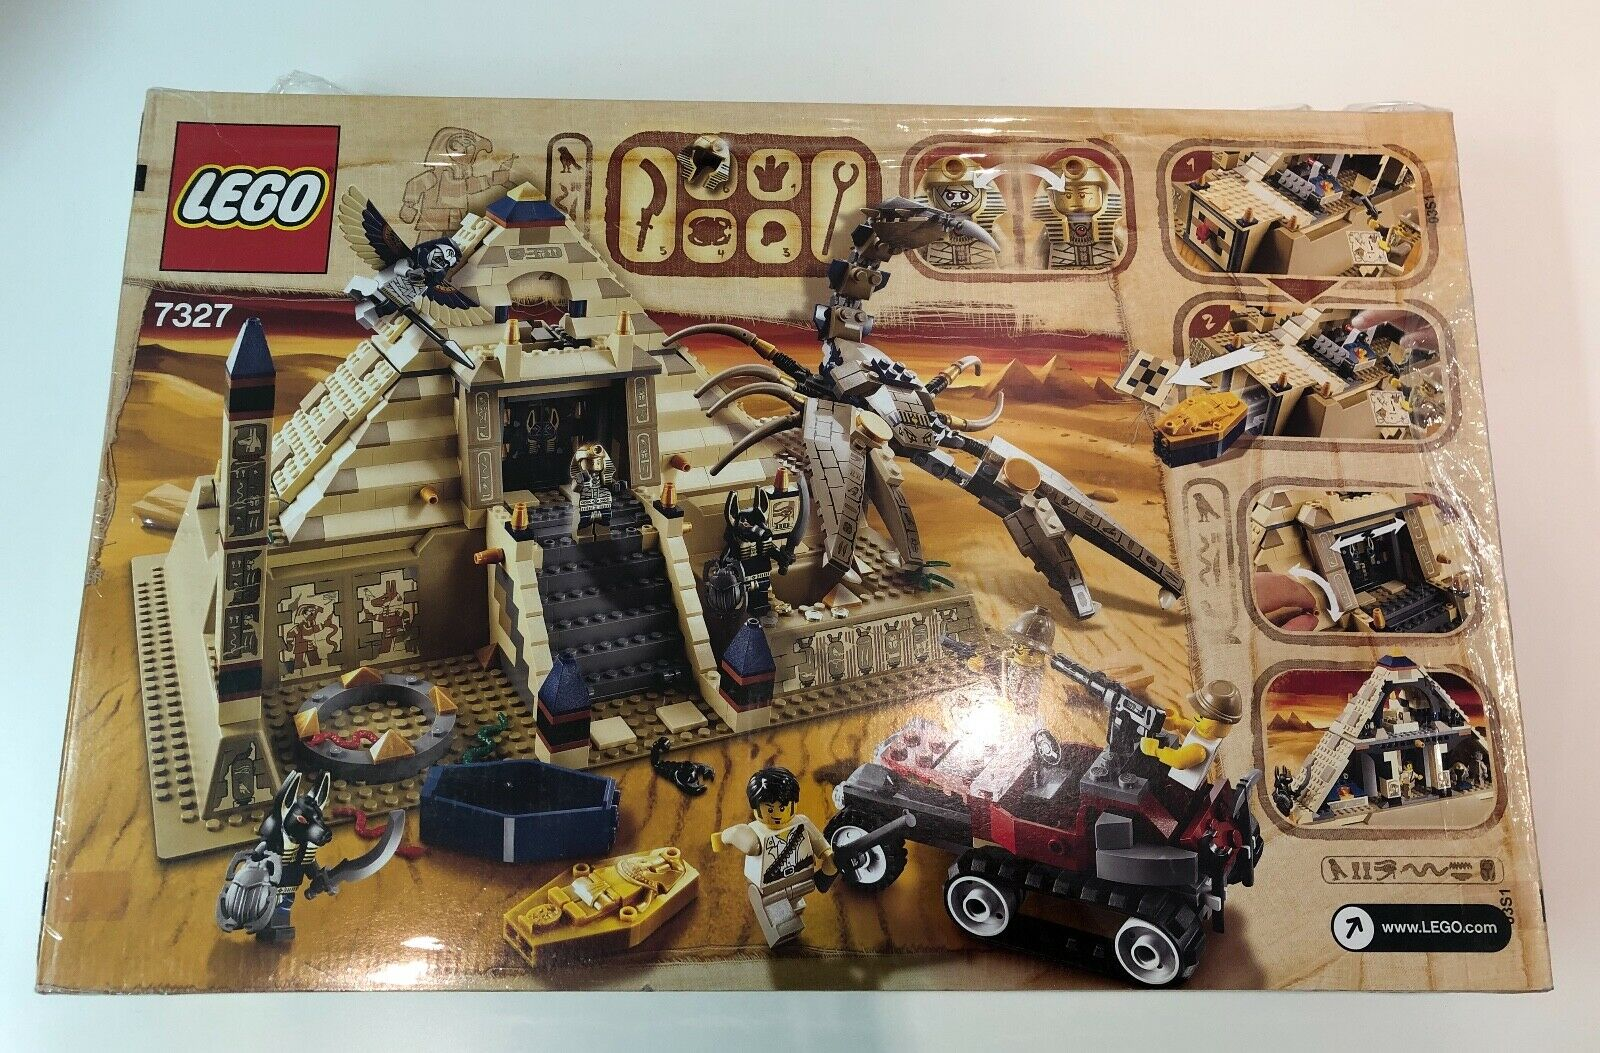 LEGO Pharaoh's Quest   7327 - Scorpion Scorpion Scorpion Pyramid - NEUF NEW SCELLÉE SEALED 672342